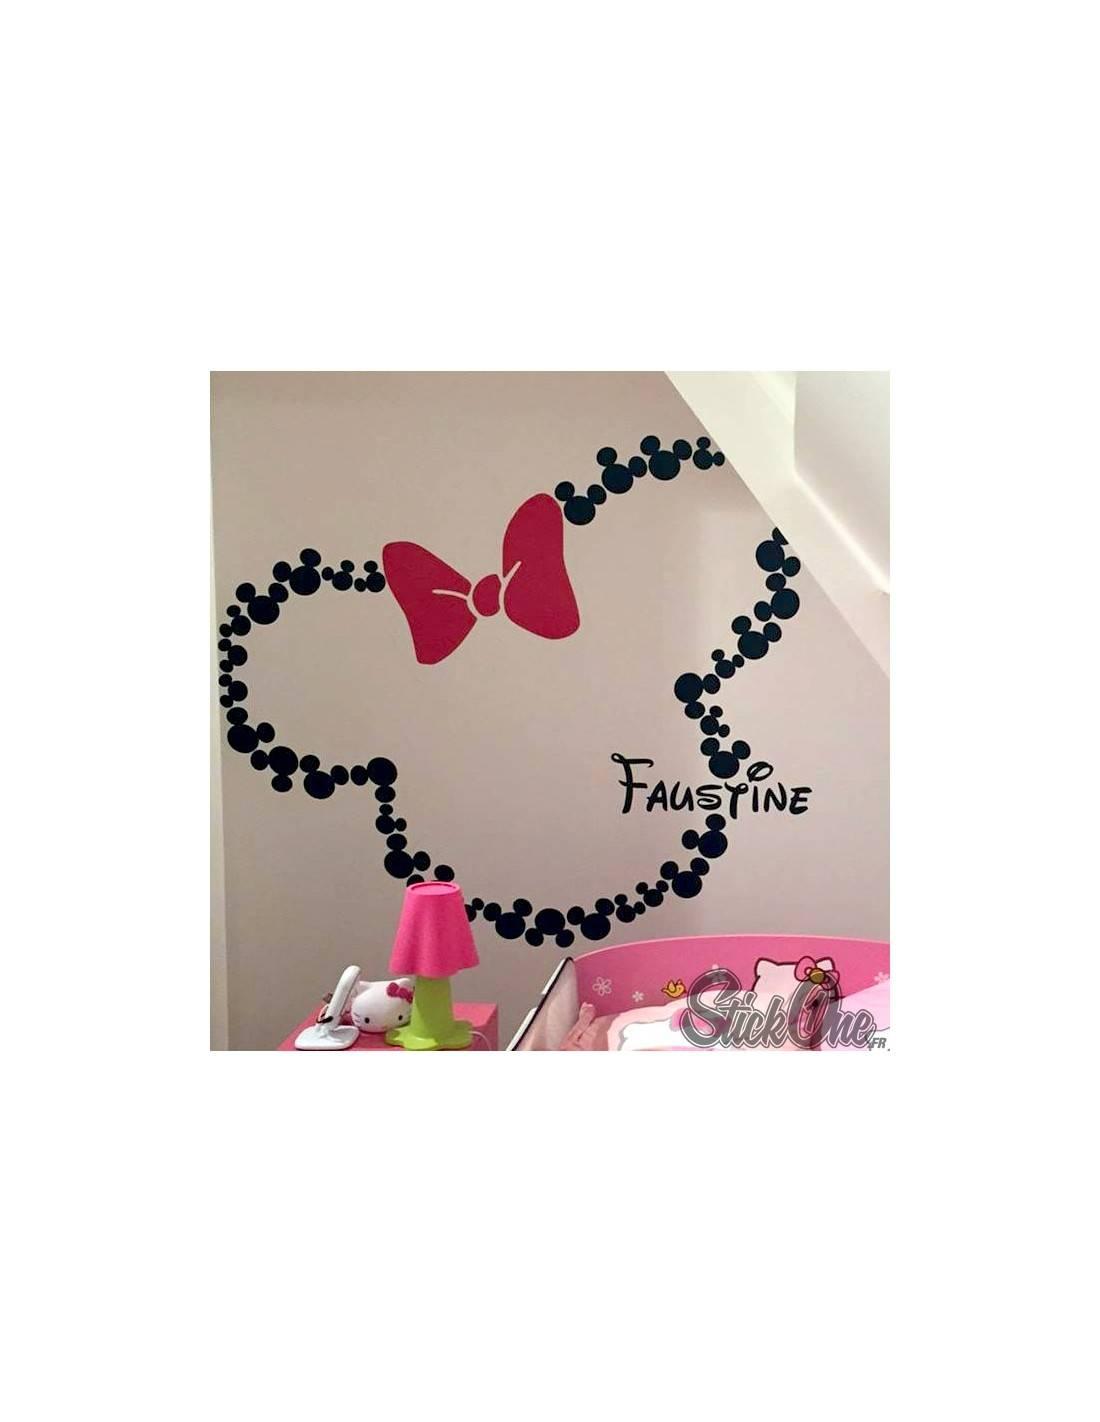 stickers t te de mickey personnaliser stickers enfant personnalis s. Black Bedroom Furniture Sets. Home Design Ideas